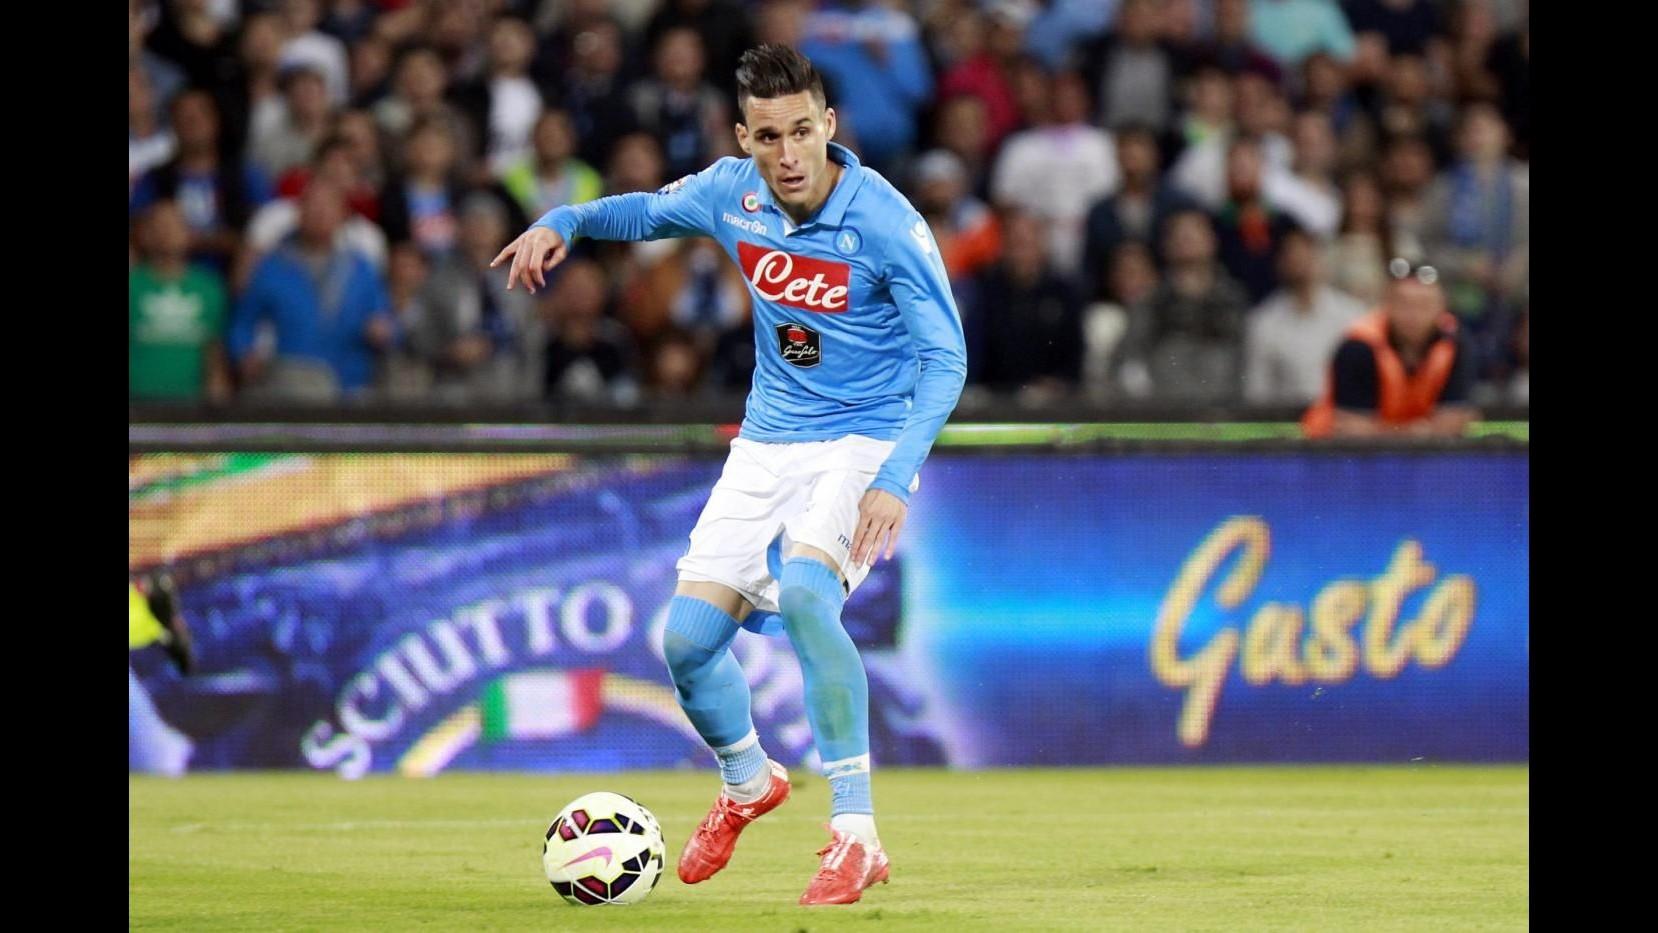 Europa League, Napoli travolge Bruges 5-0: super Callejon